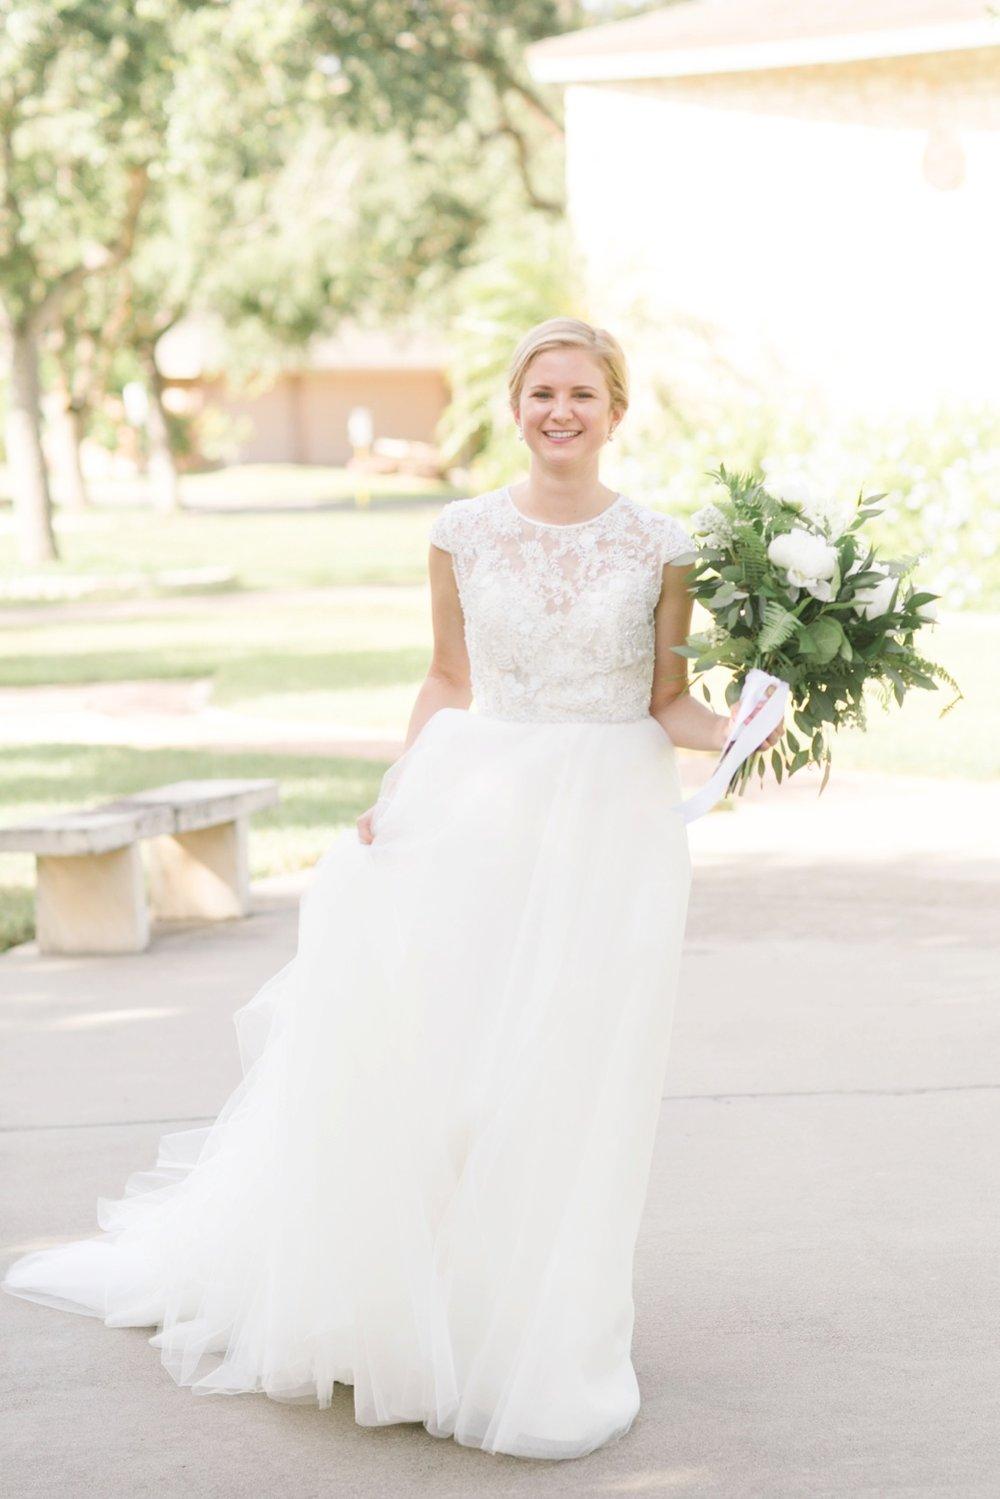 Corpus Christi Bride in a Garden Wedding I Chandras Collection Photography l www.avenueievents.com.jpg